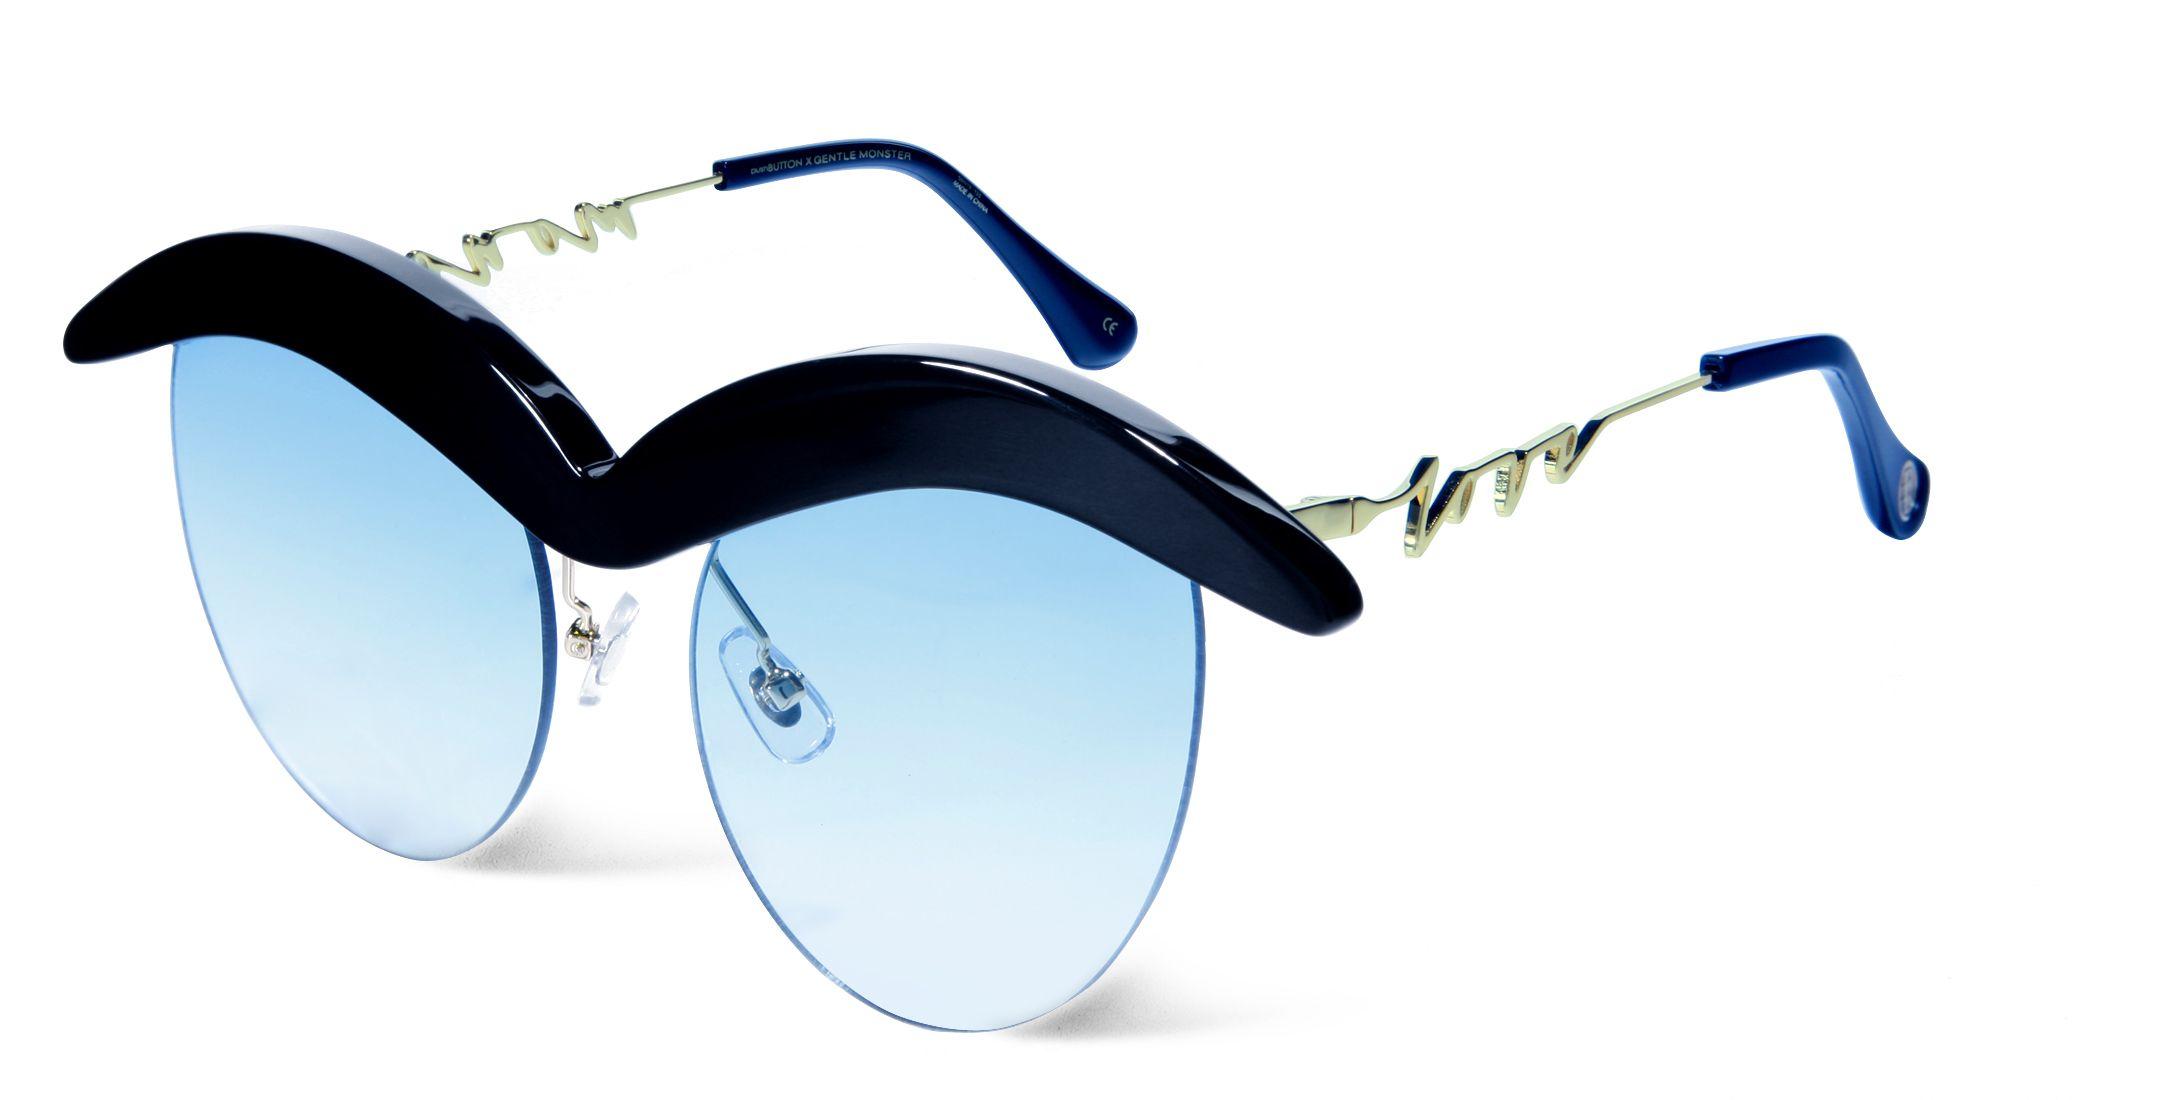 14144de918cf GENTLE MONSTER - FRIDA KAHLO 01(BL) - PUSHBUTTON X GENTLE MONSTER Latest  Sunglasses